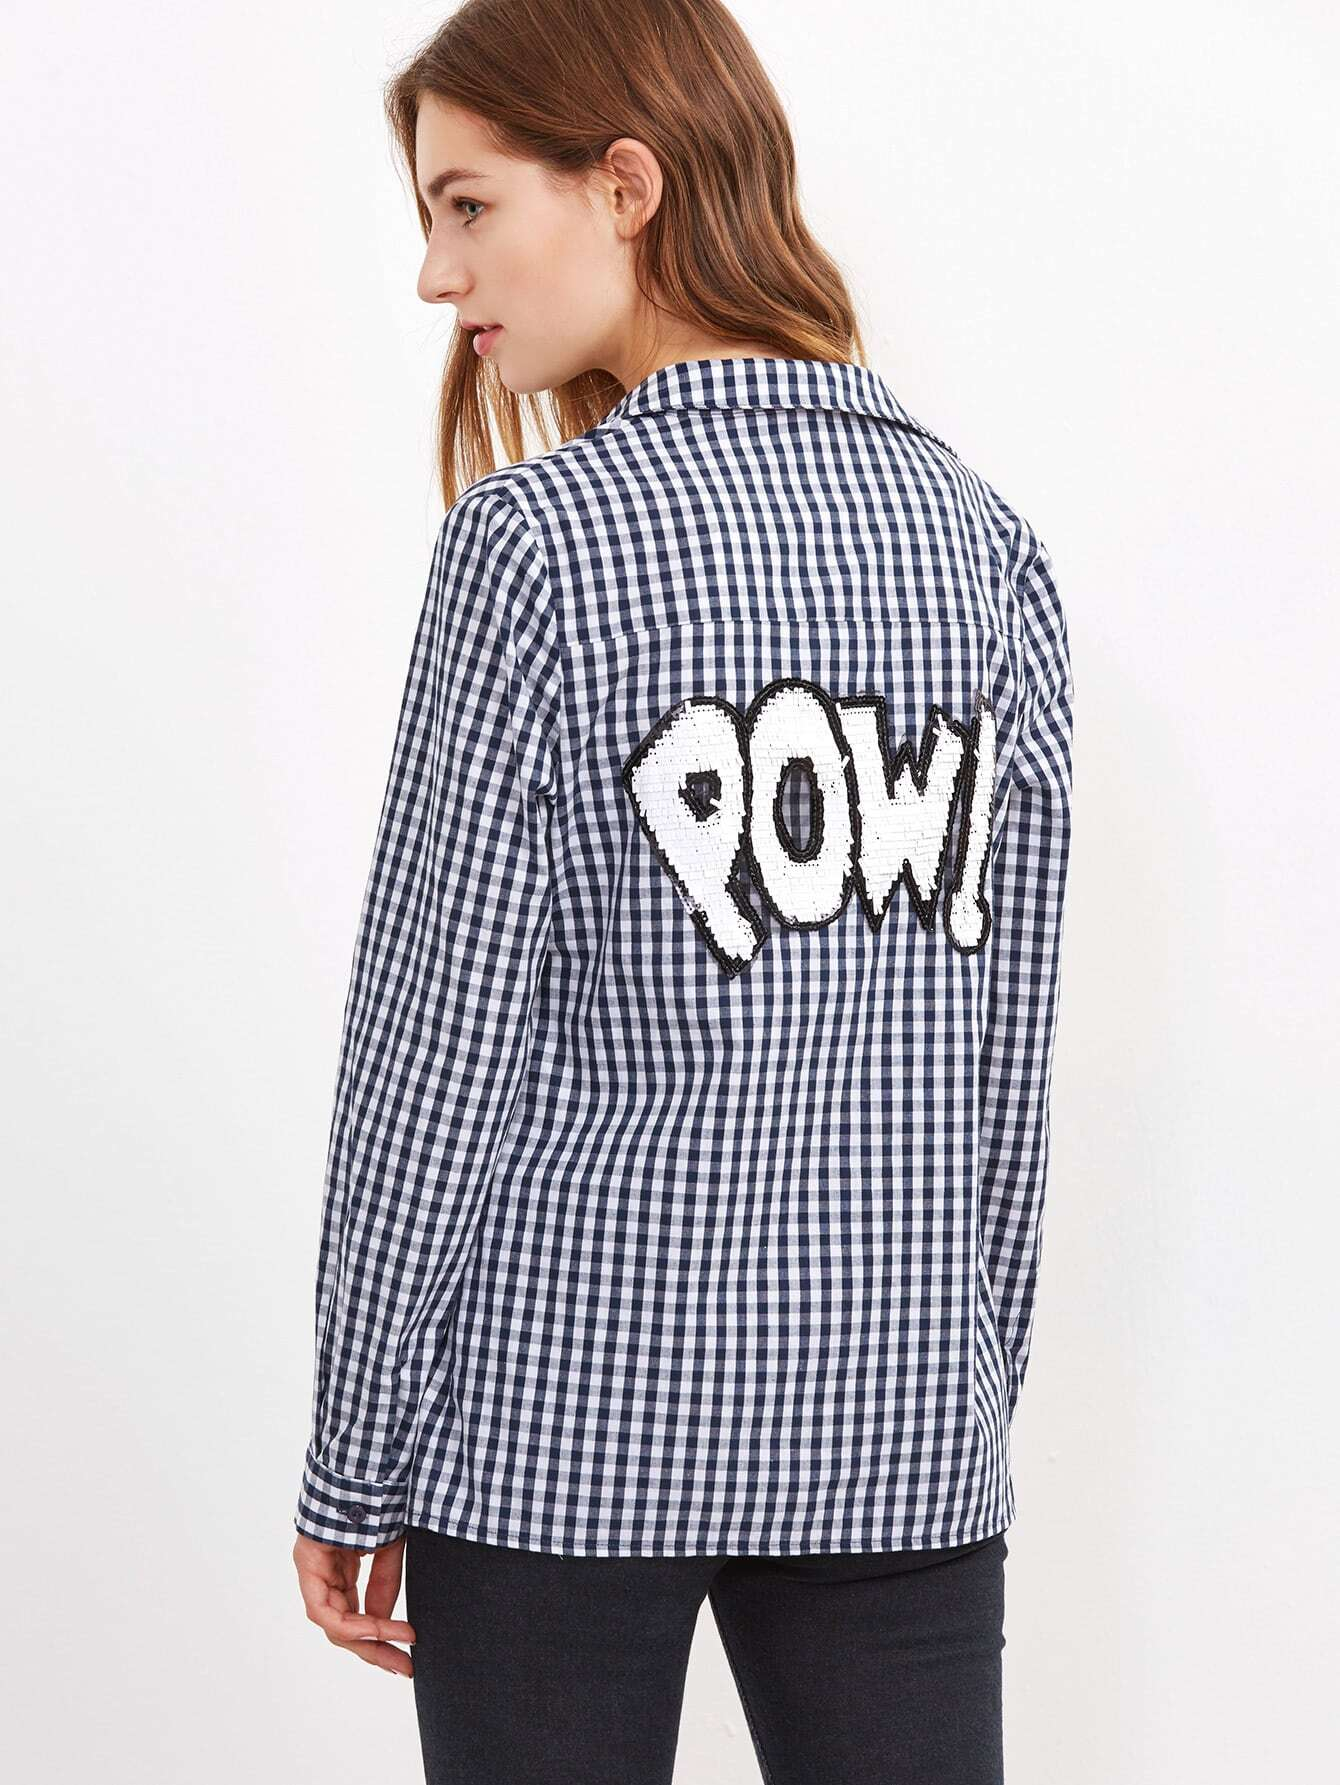 blouse161012703_2